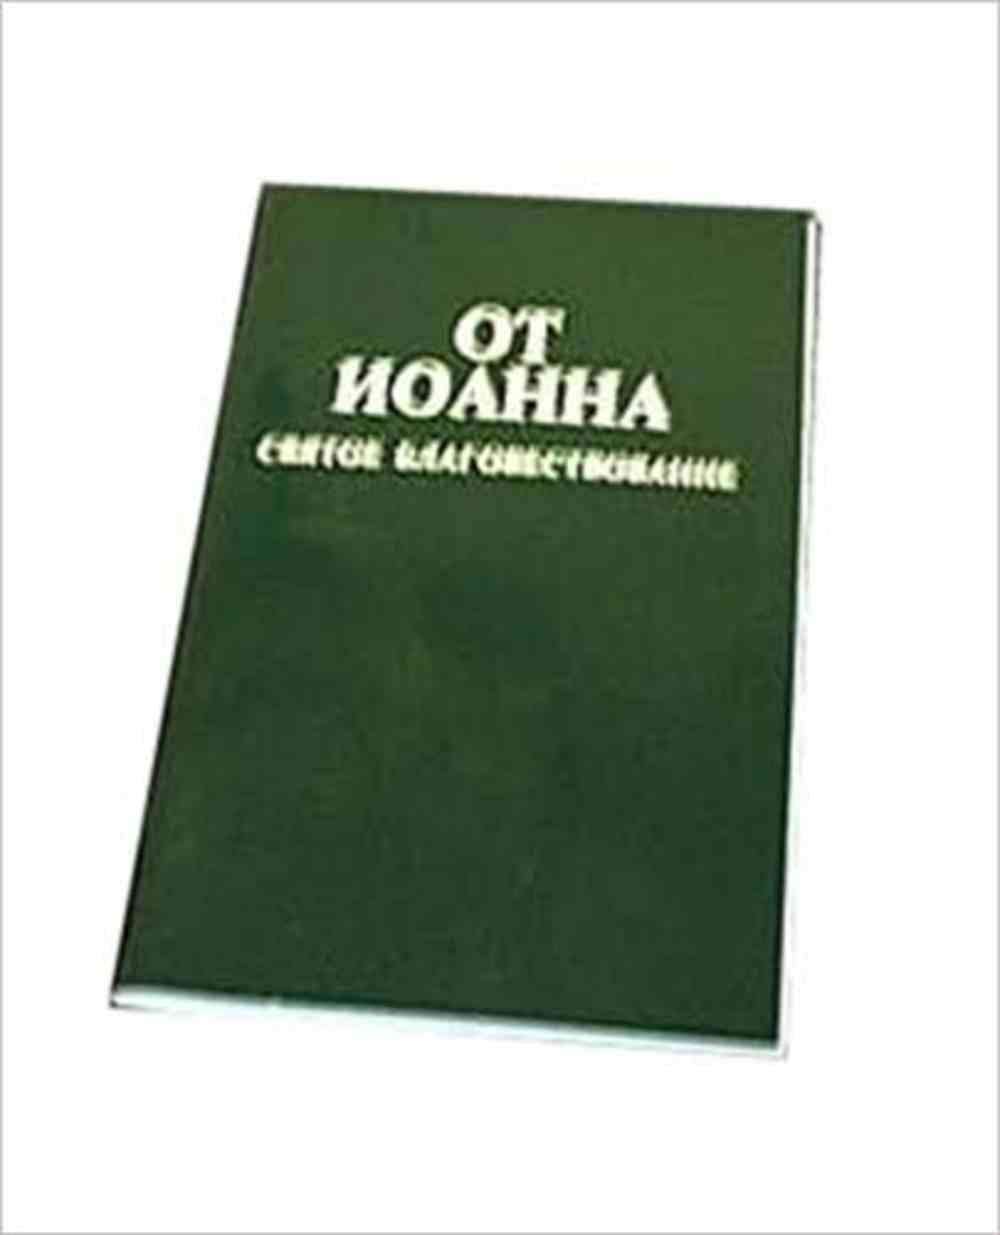 Russian Gospel of John (Black Letter Edition) Paperback